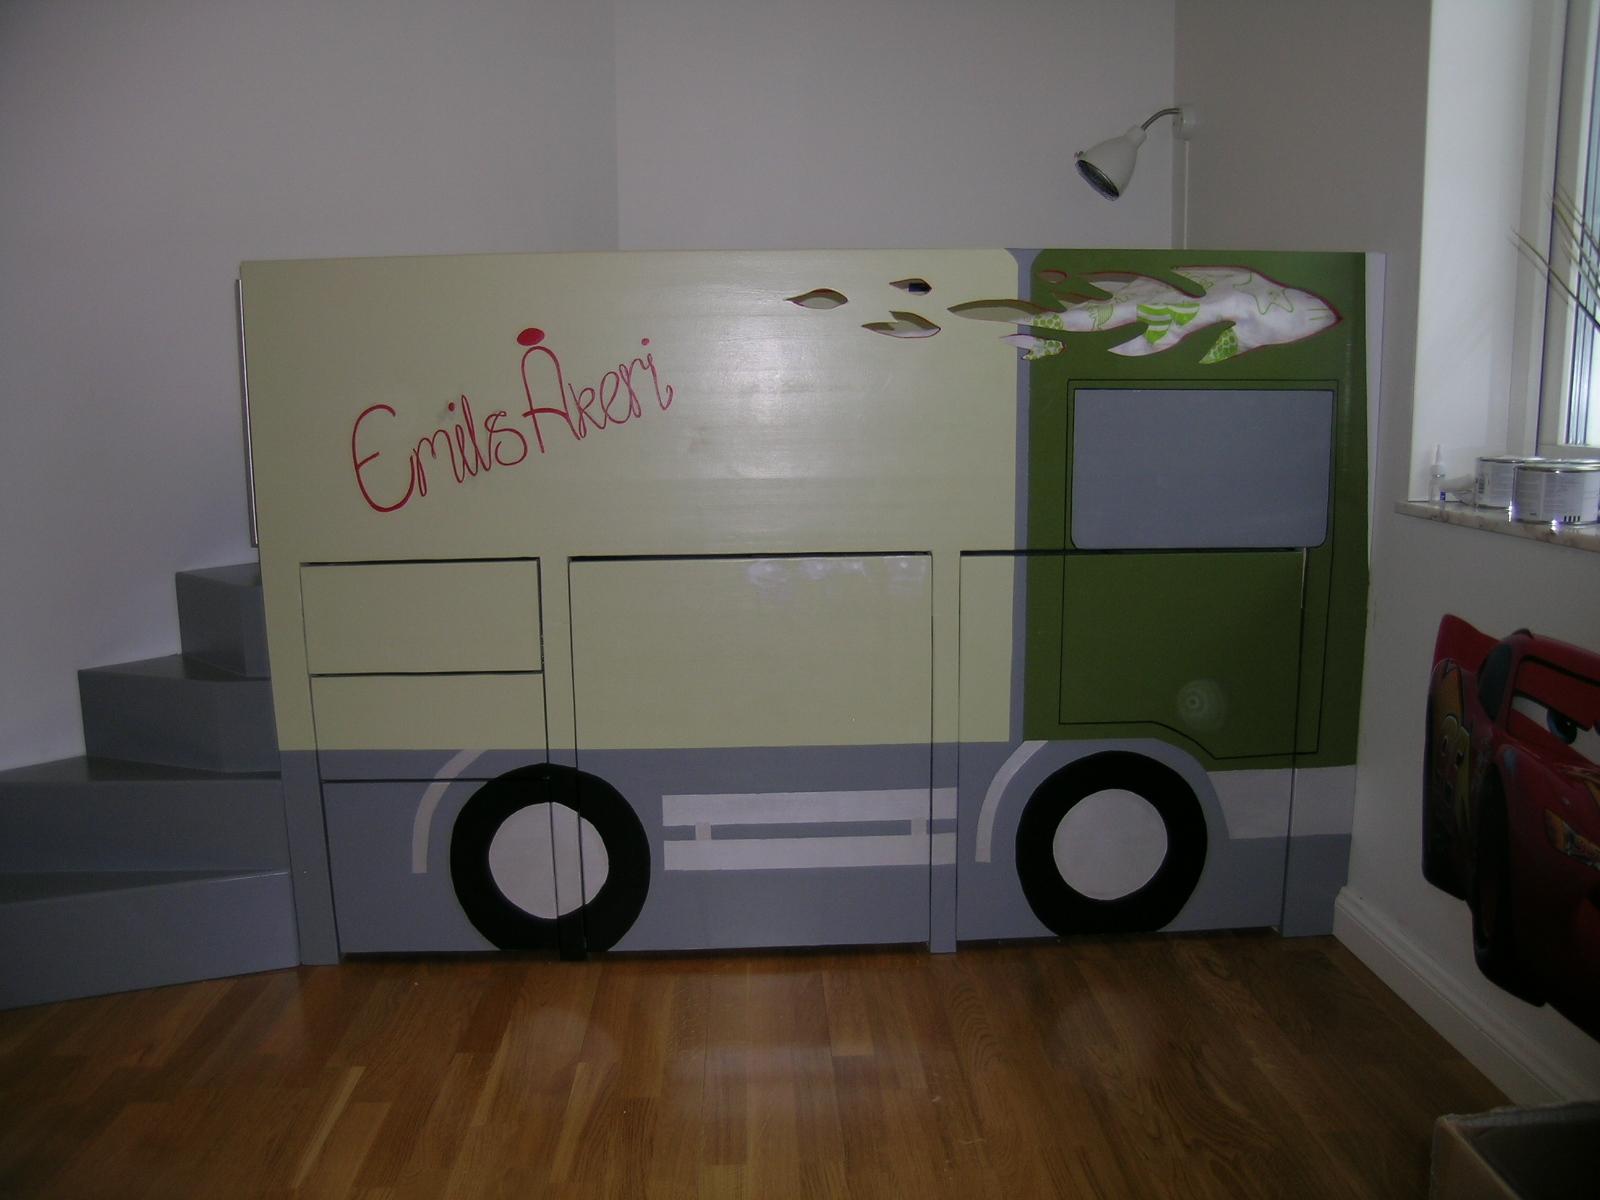 säng-illusionsmåleri lastbil